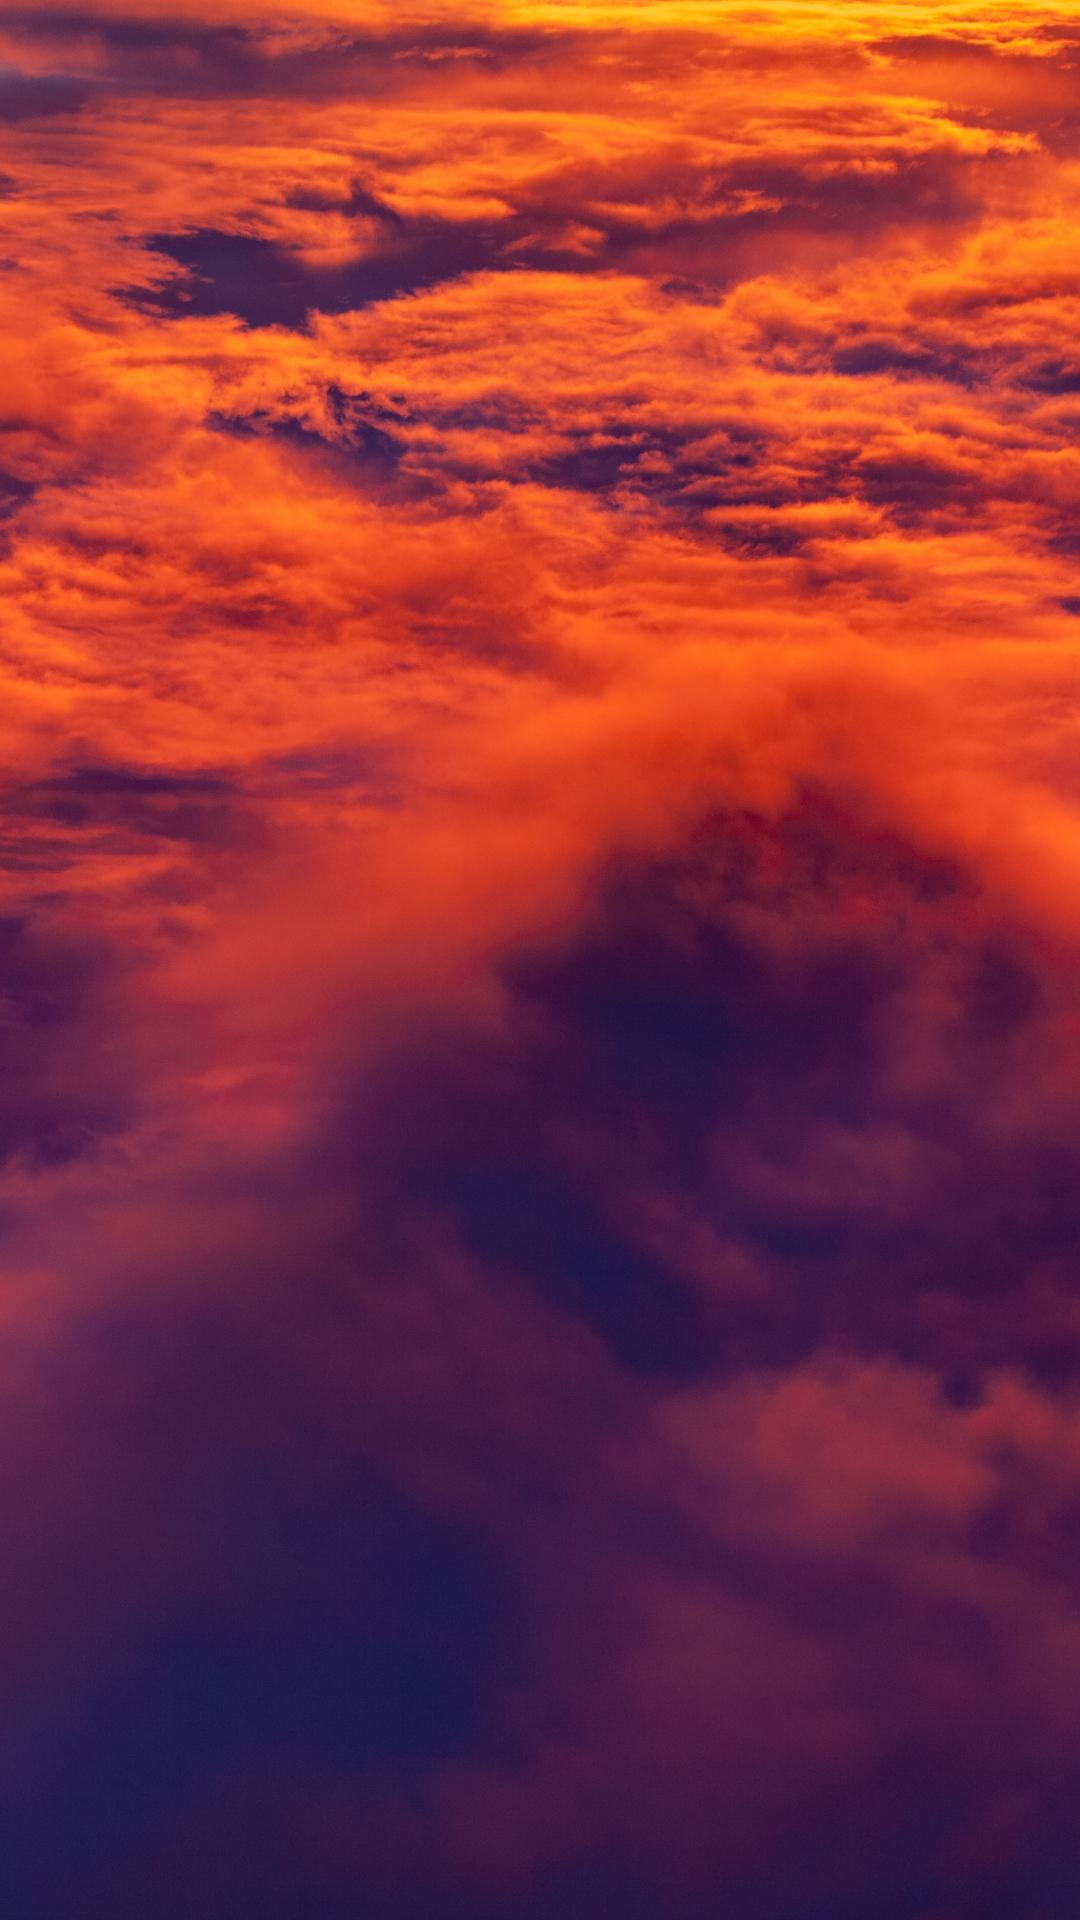 Aerial Cloud Sunset Iphone Wallpaper Idrop News